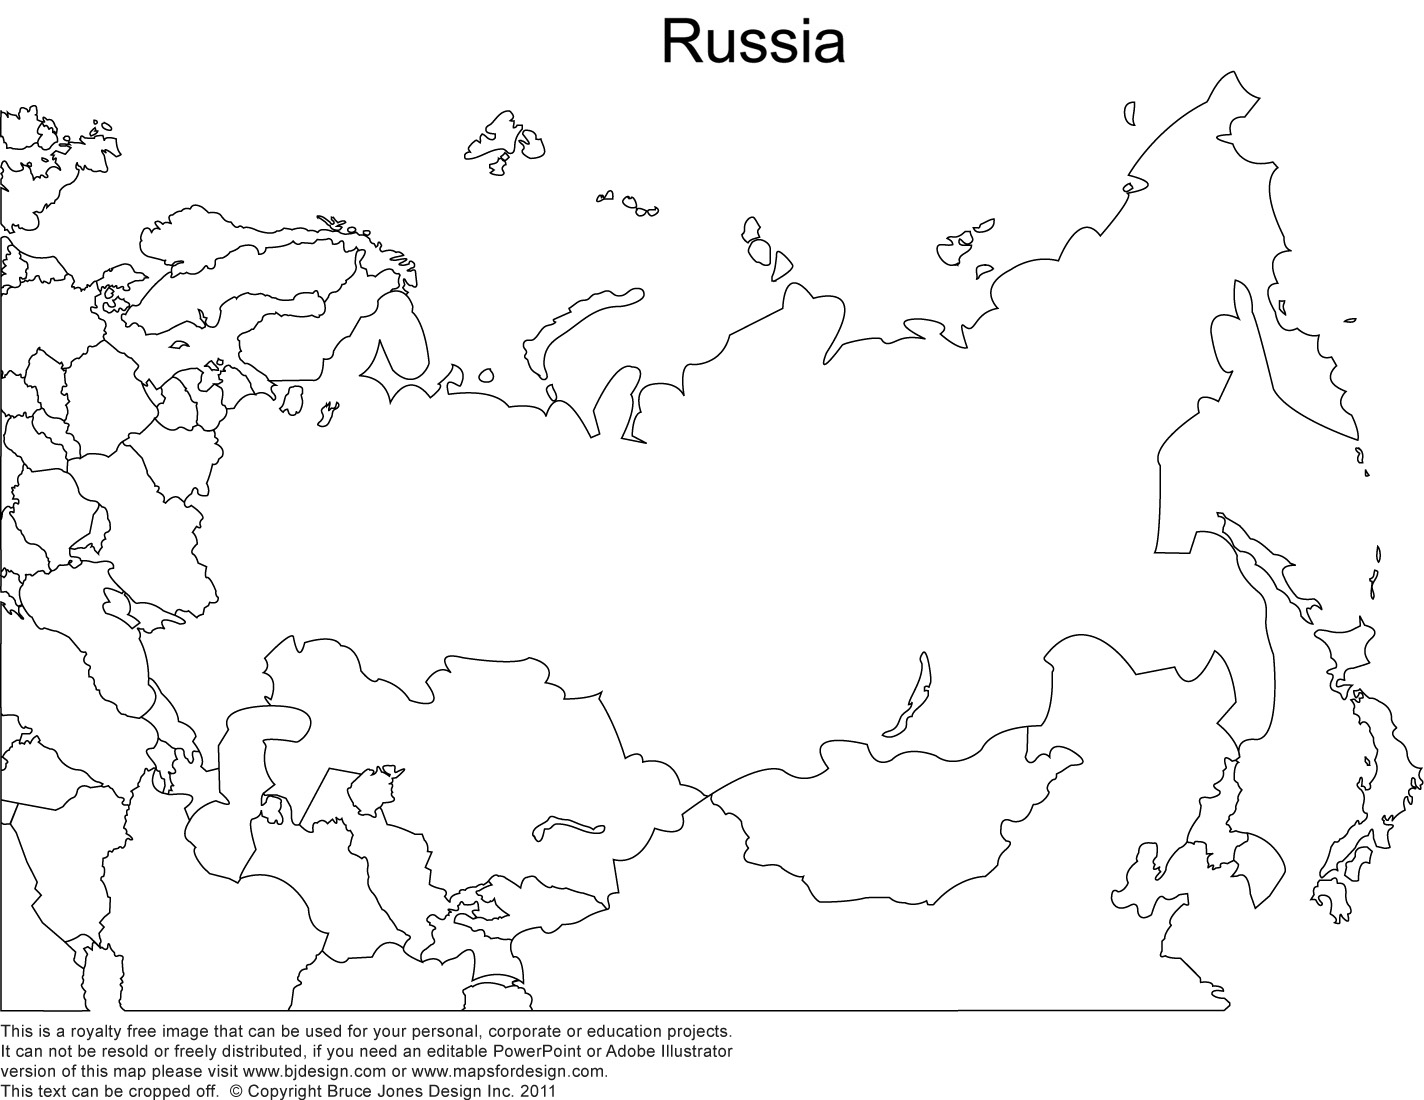 World Regional Printable Blank Maps Royalty Free Jpg Freeusandworldmaps Com